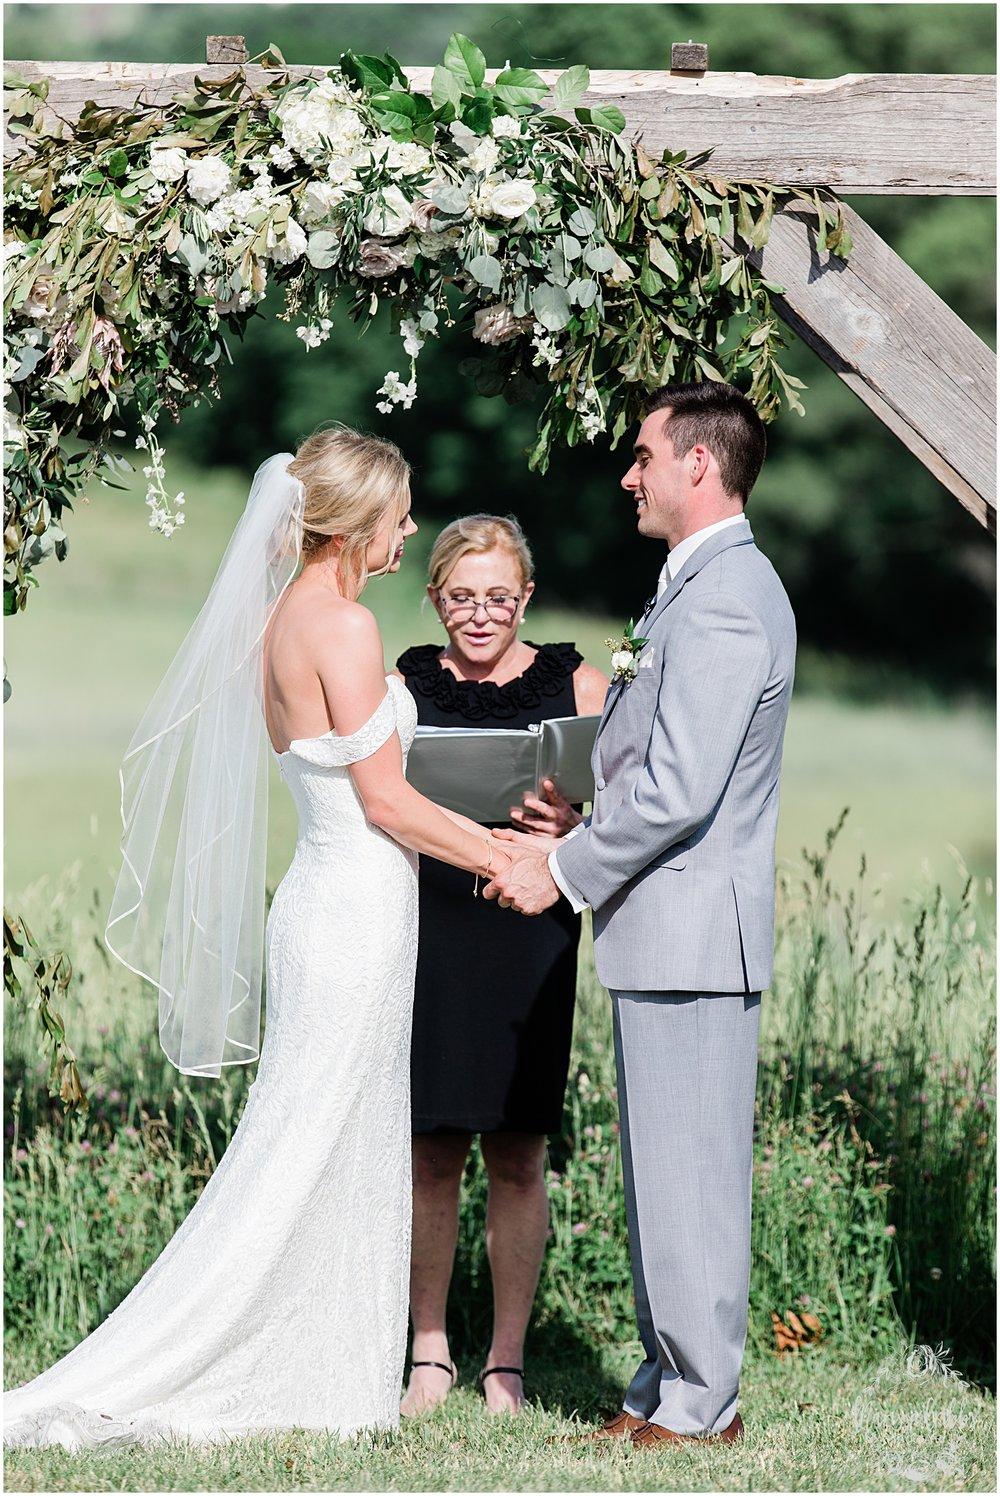 RHODES WEDDING | WESTON RED BARN FARM | MARISSA CRIBBS PHOTOGRAPHY_5276.jpg